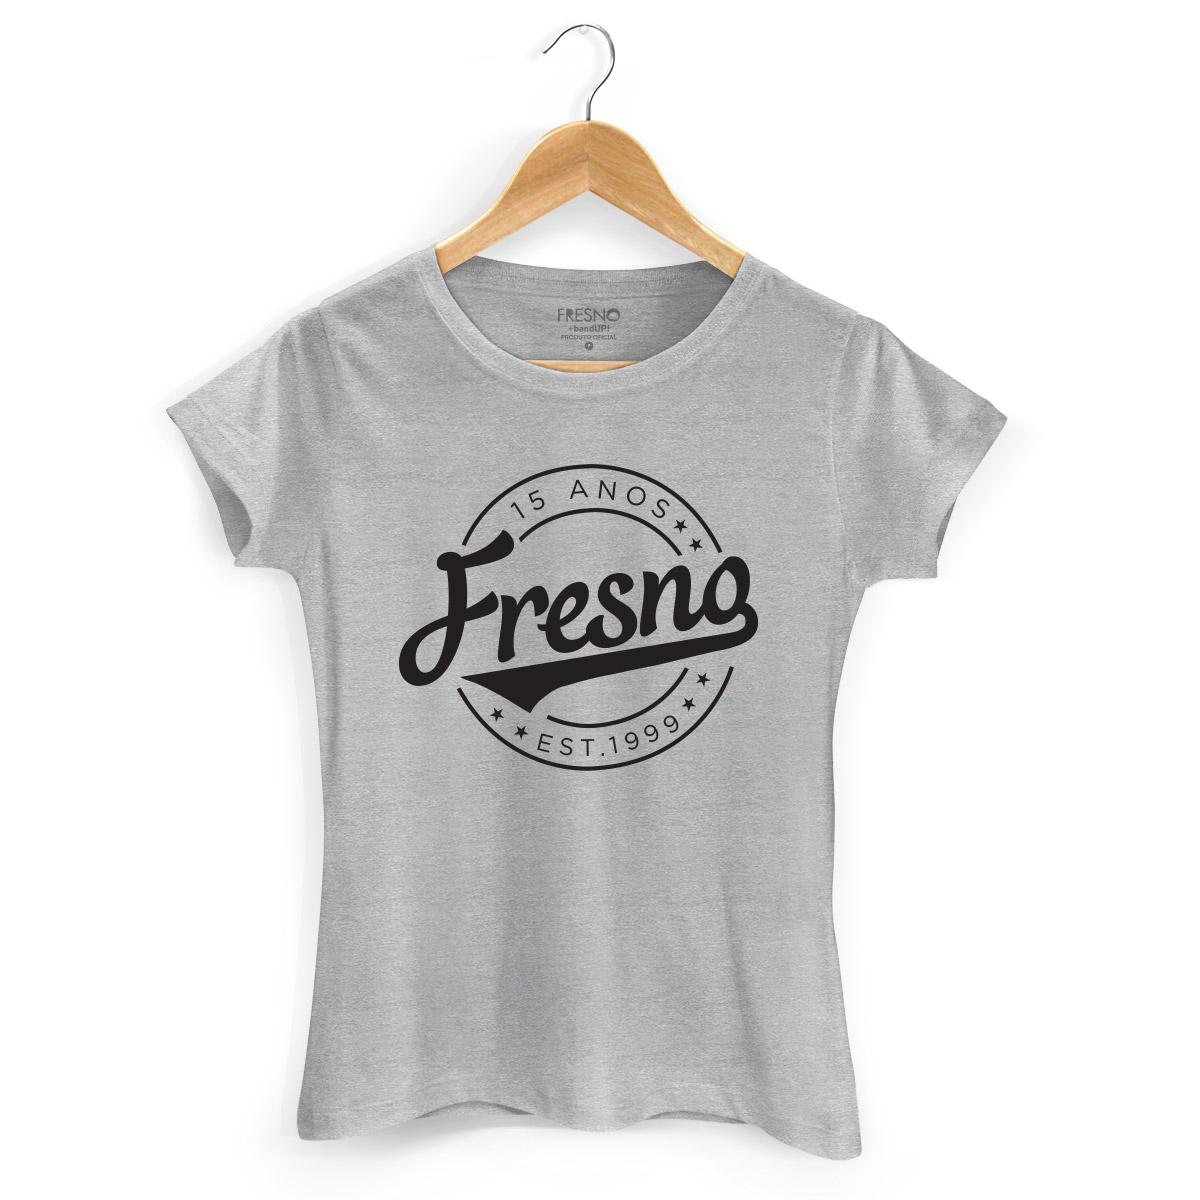 Camiseta Feminina Fresno 15 Anos Est 1999